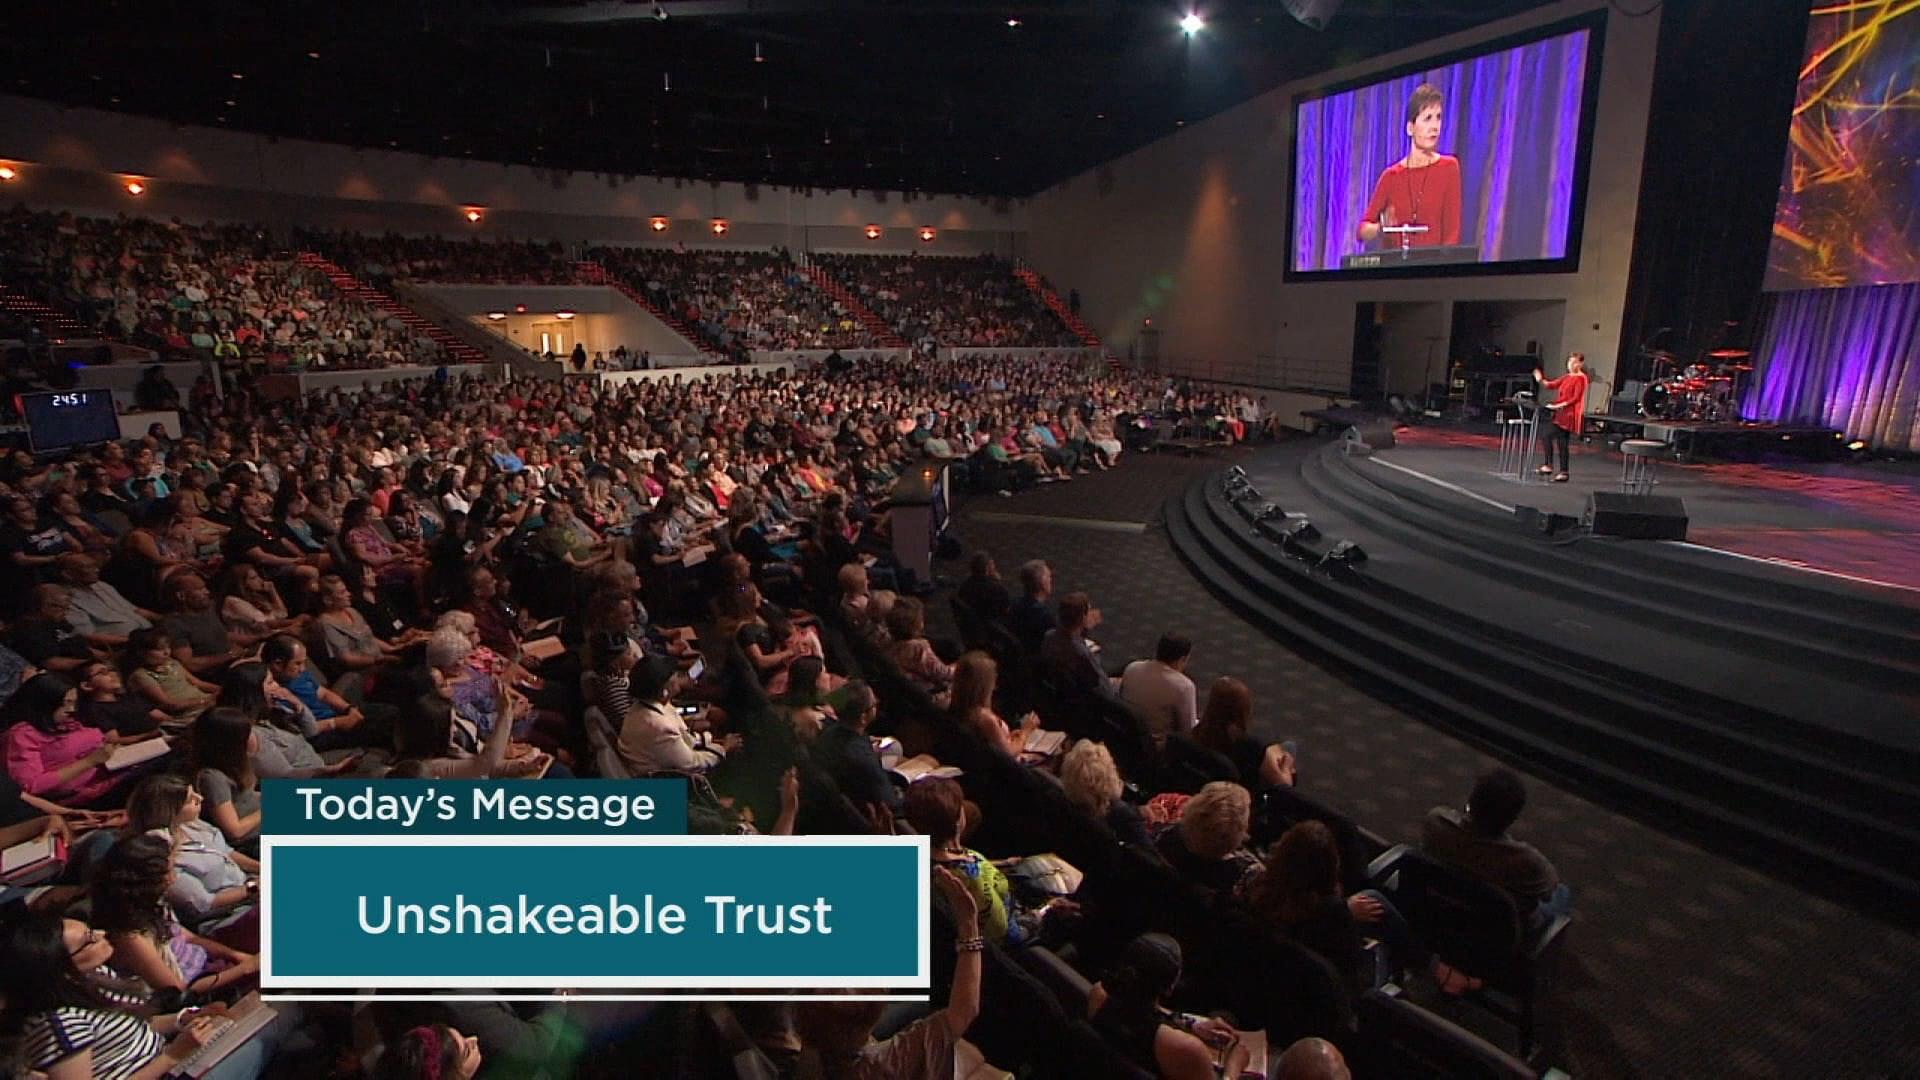 Watch Unshakeable Trust Part 2